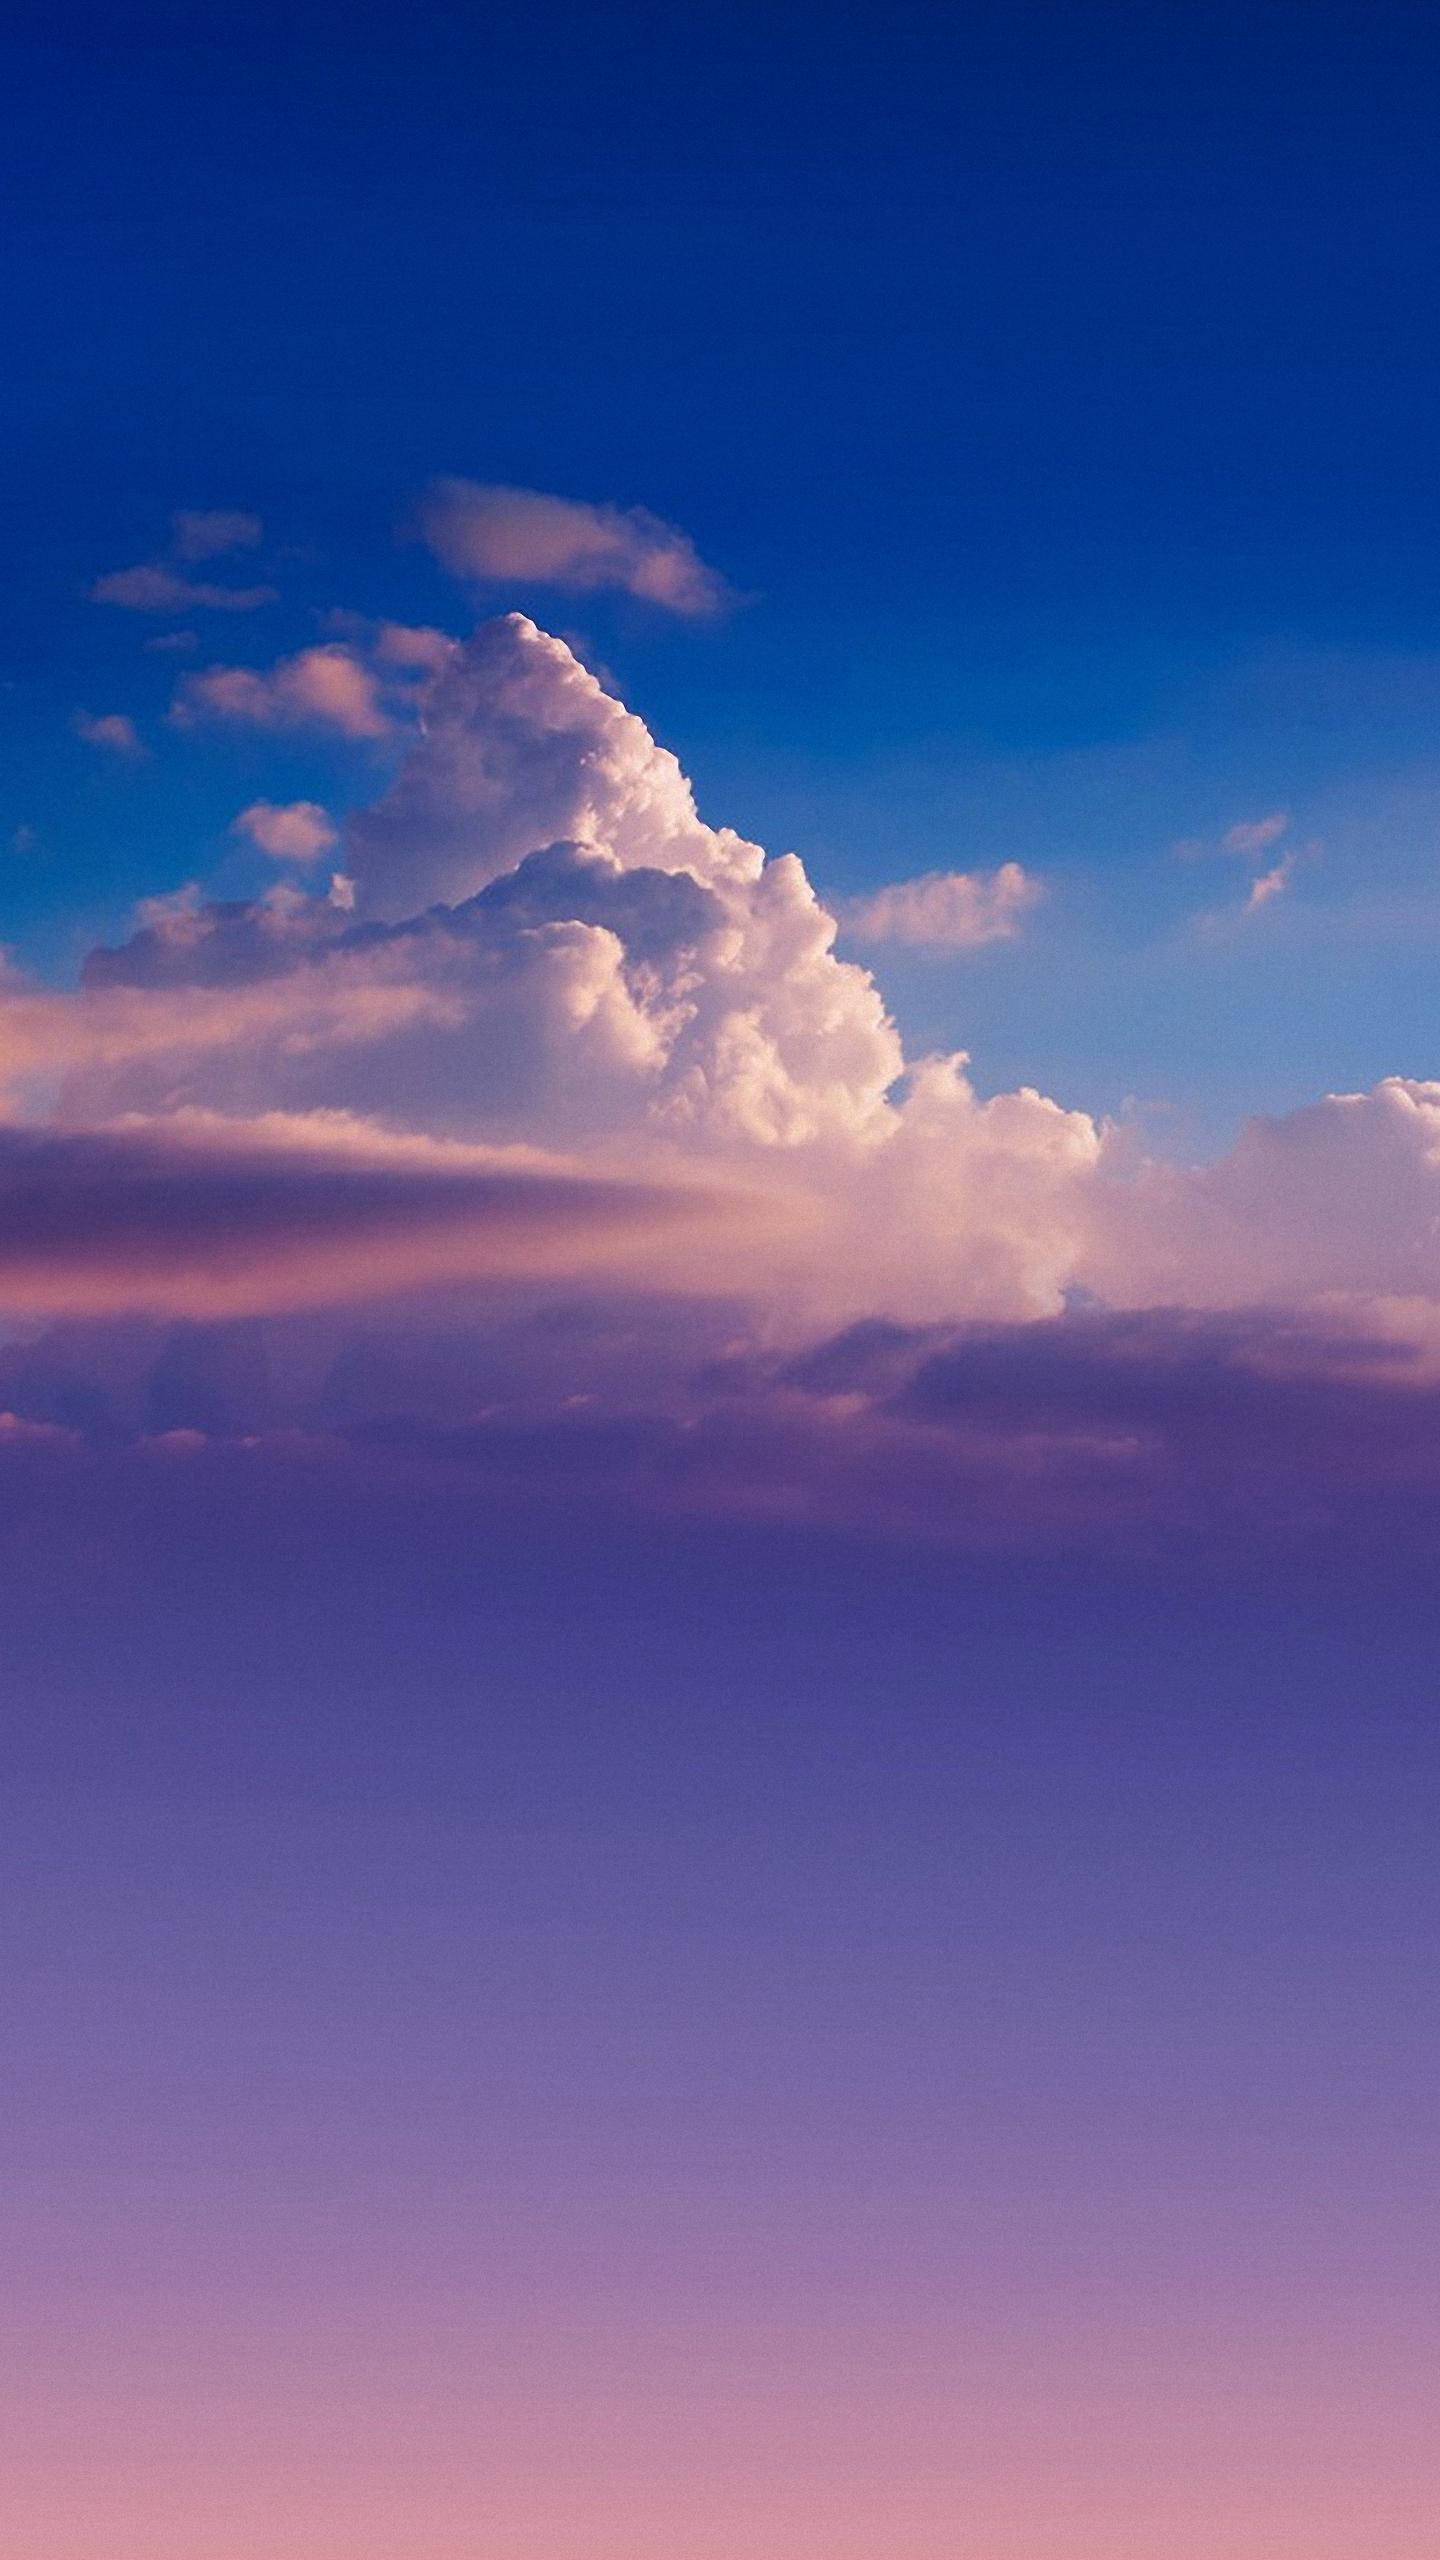 Fall Live Wallpaper Clouds Iphone Backgrounds Free Download Pixelstalk Net